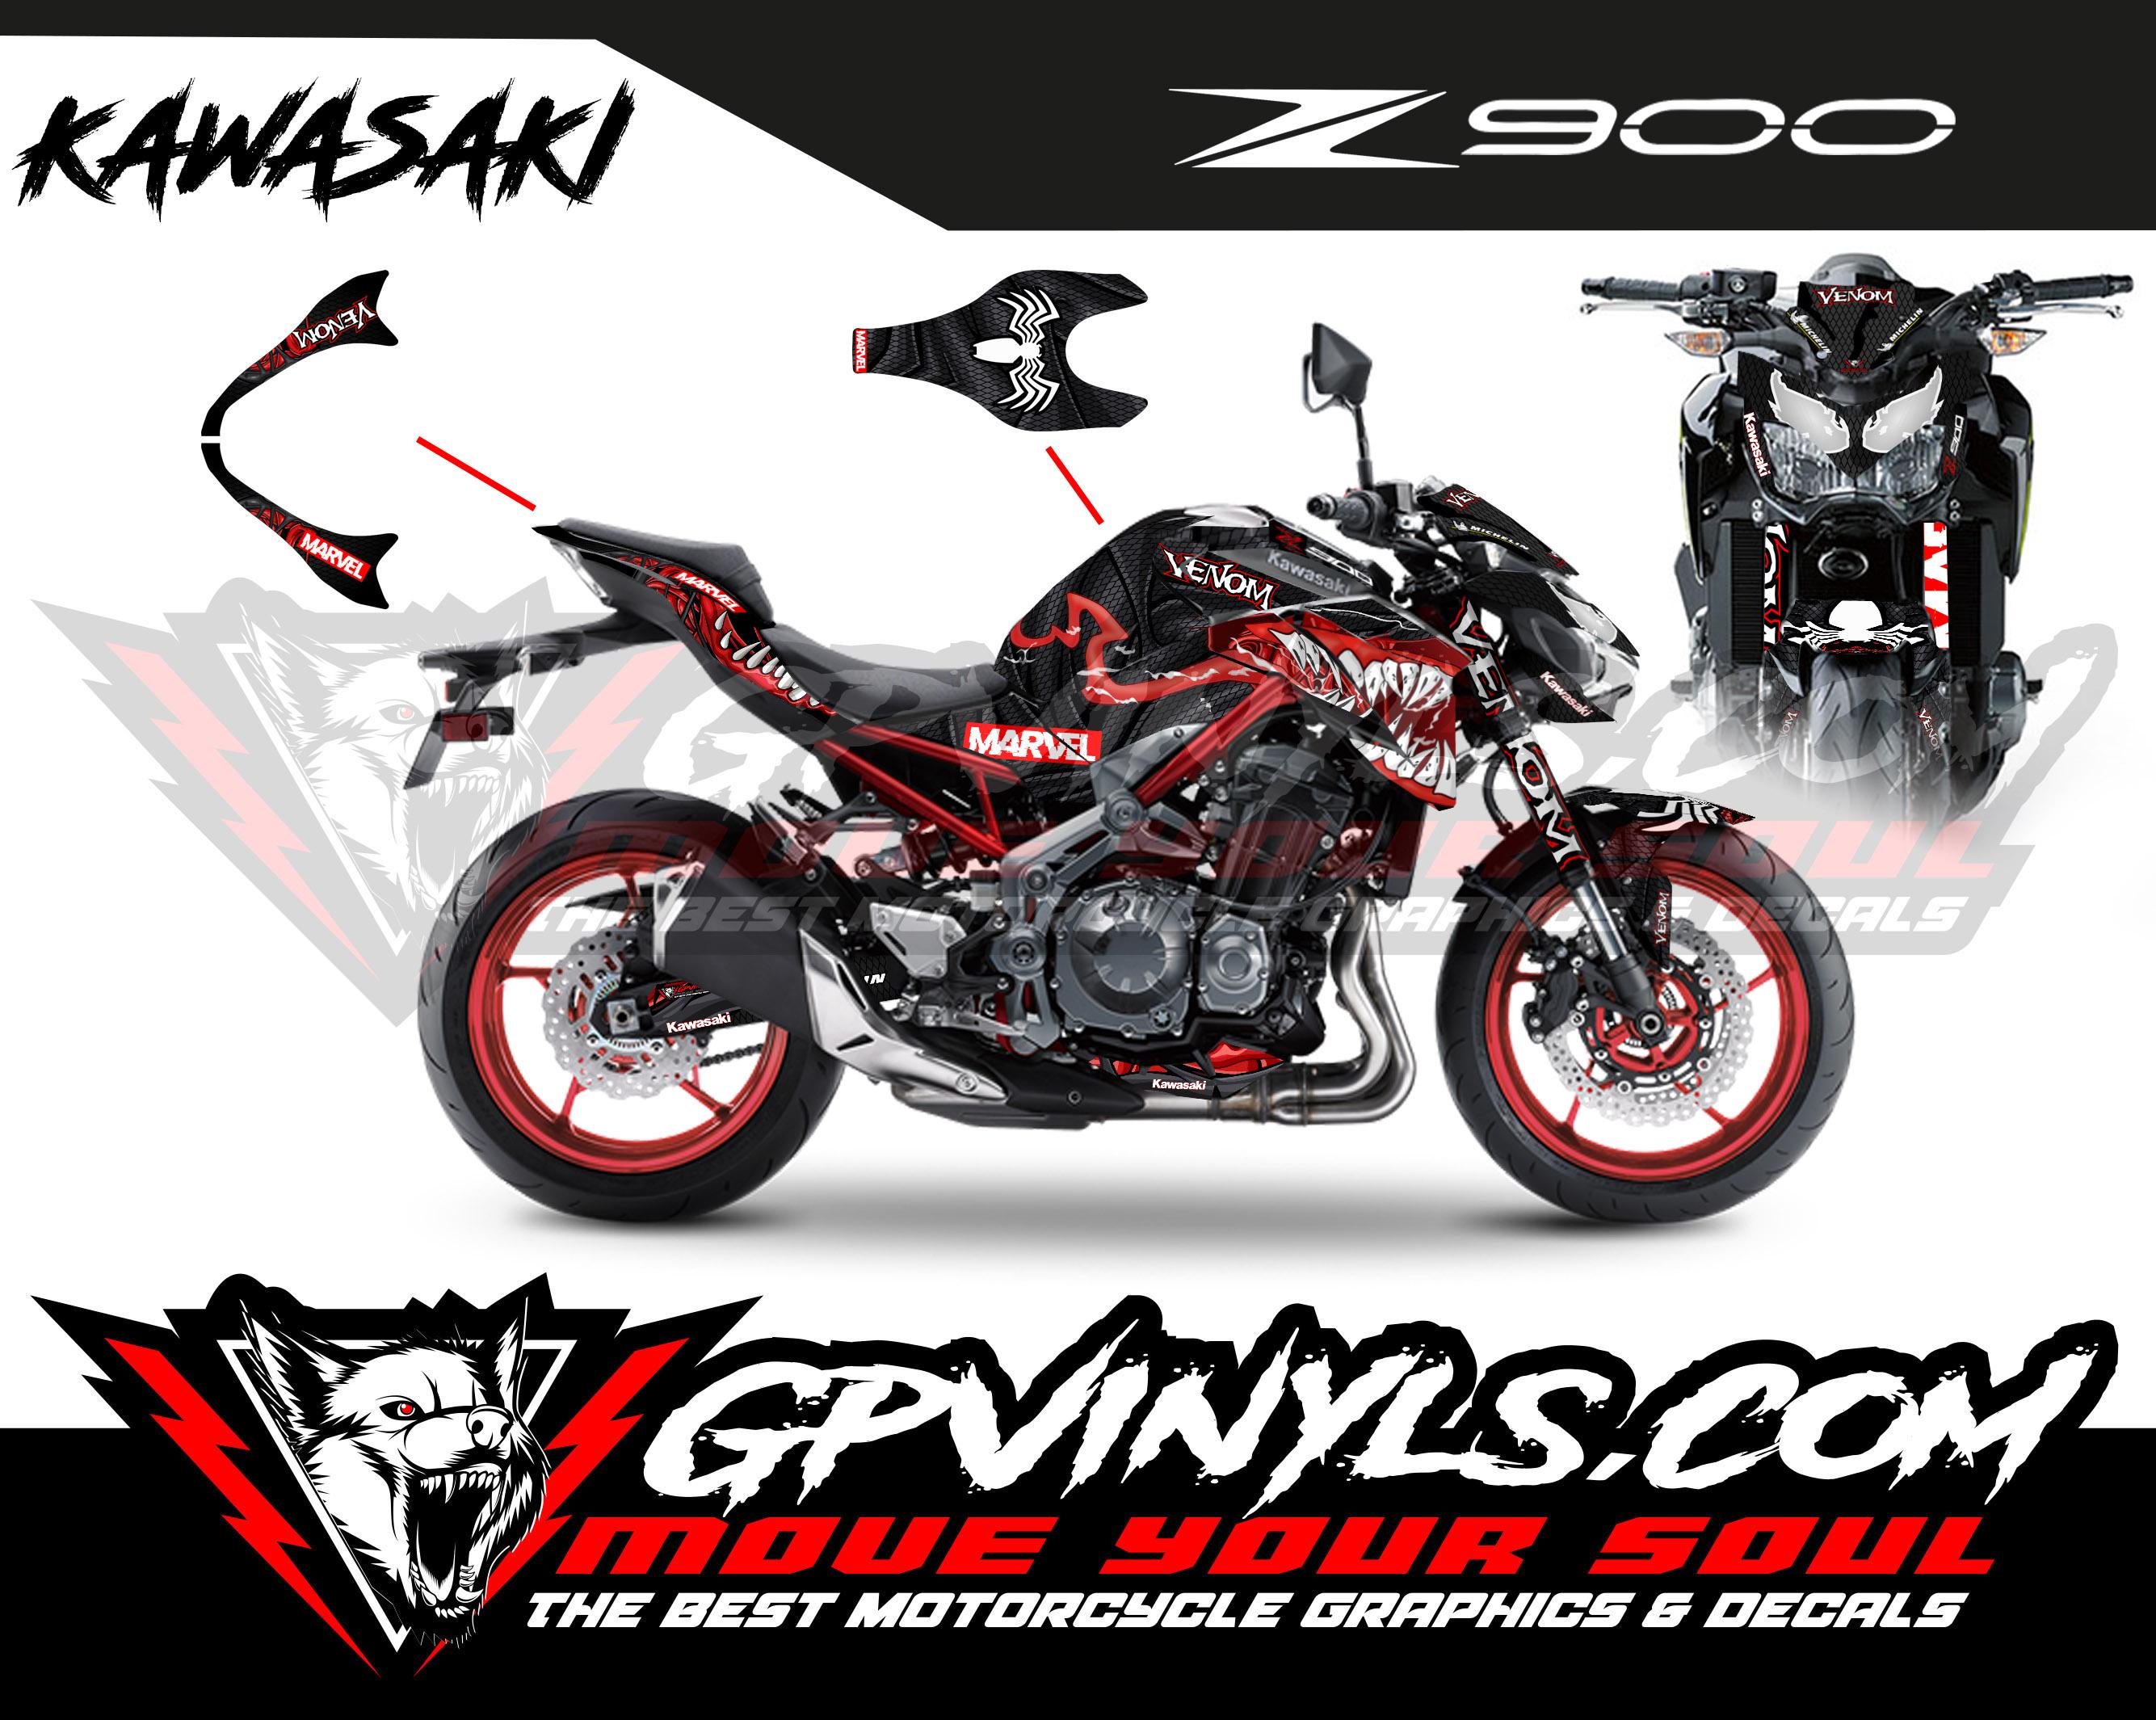 Graphic Kit Kawasaki Z900 Quot Venom Quot Gpvinyls